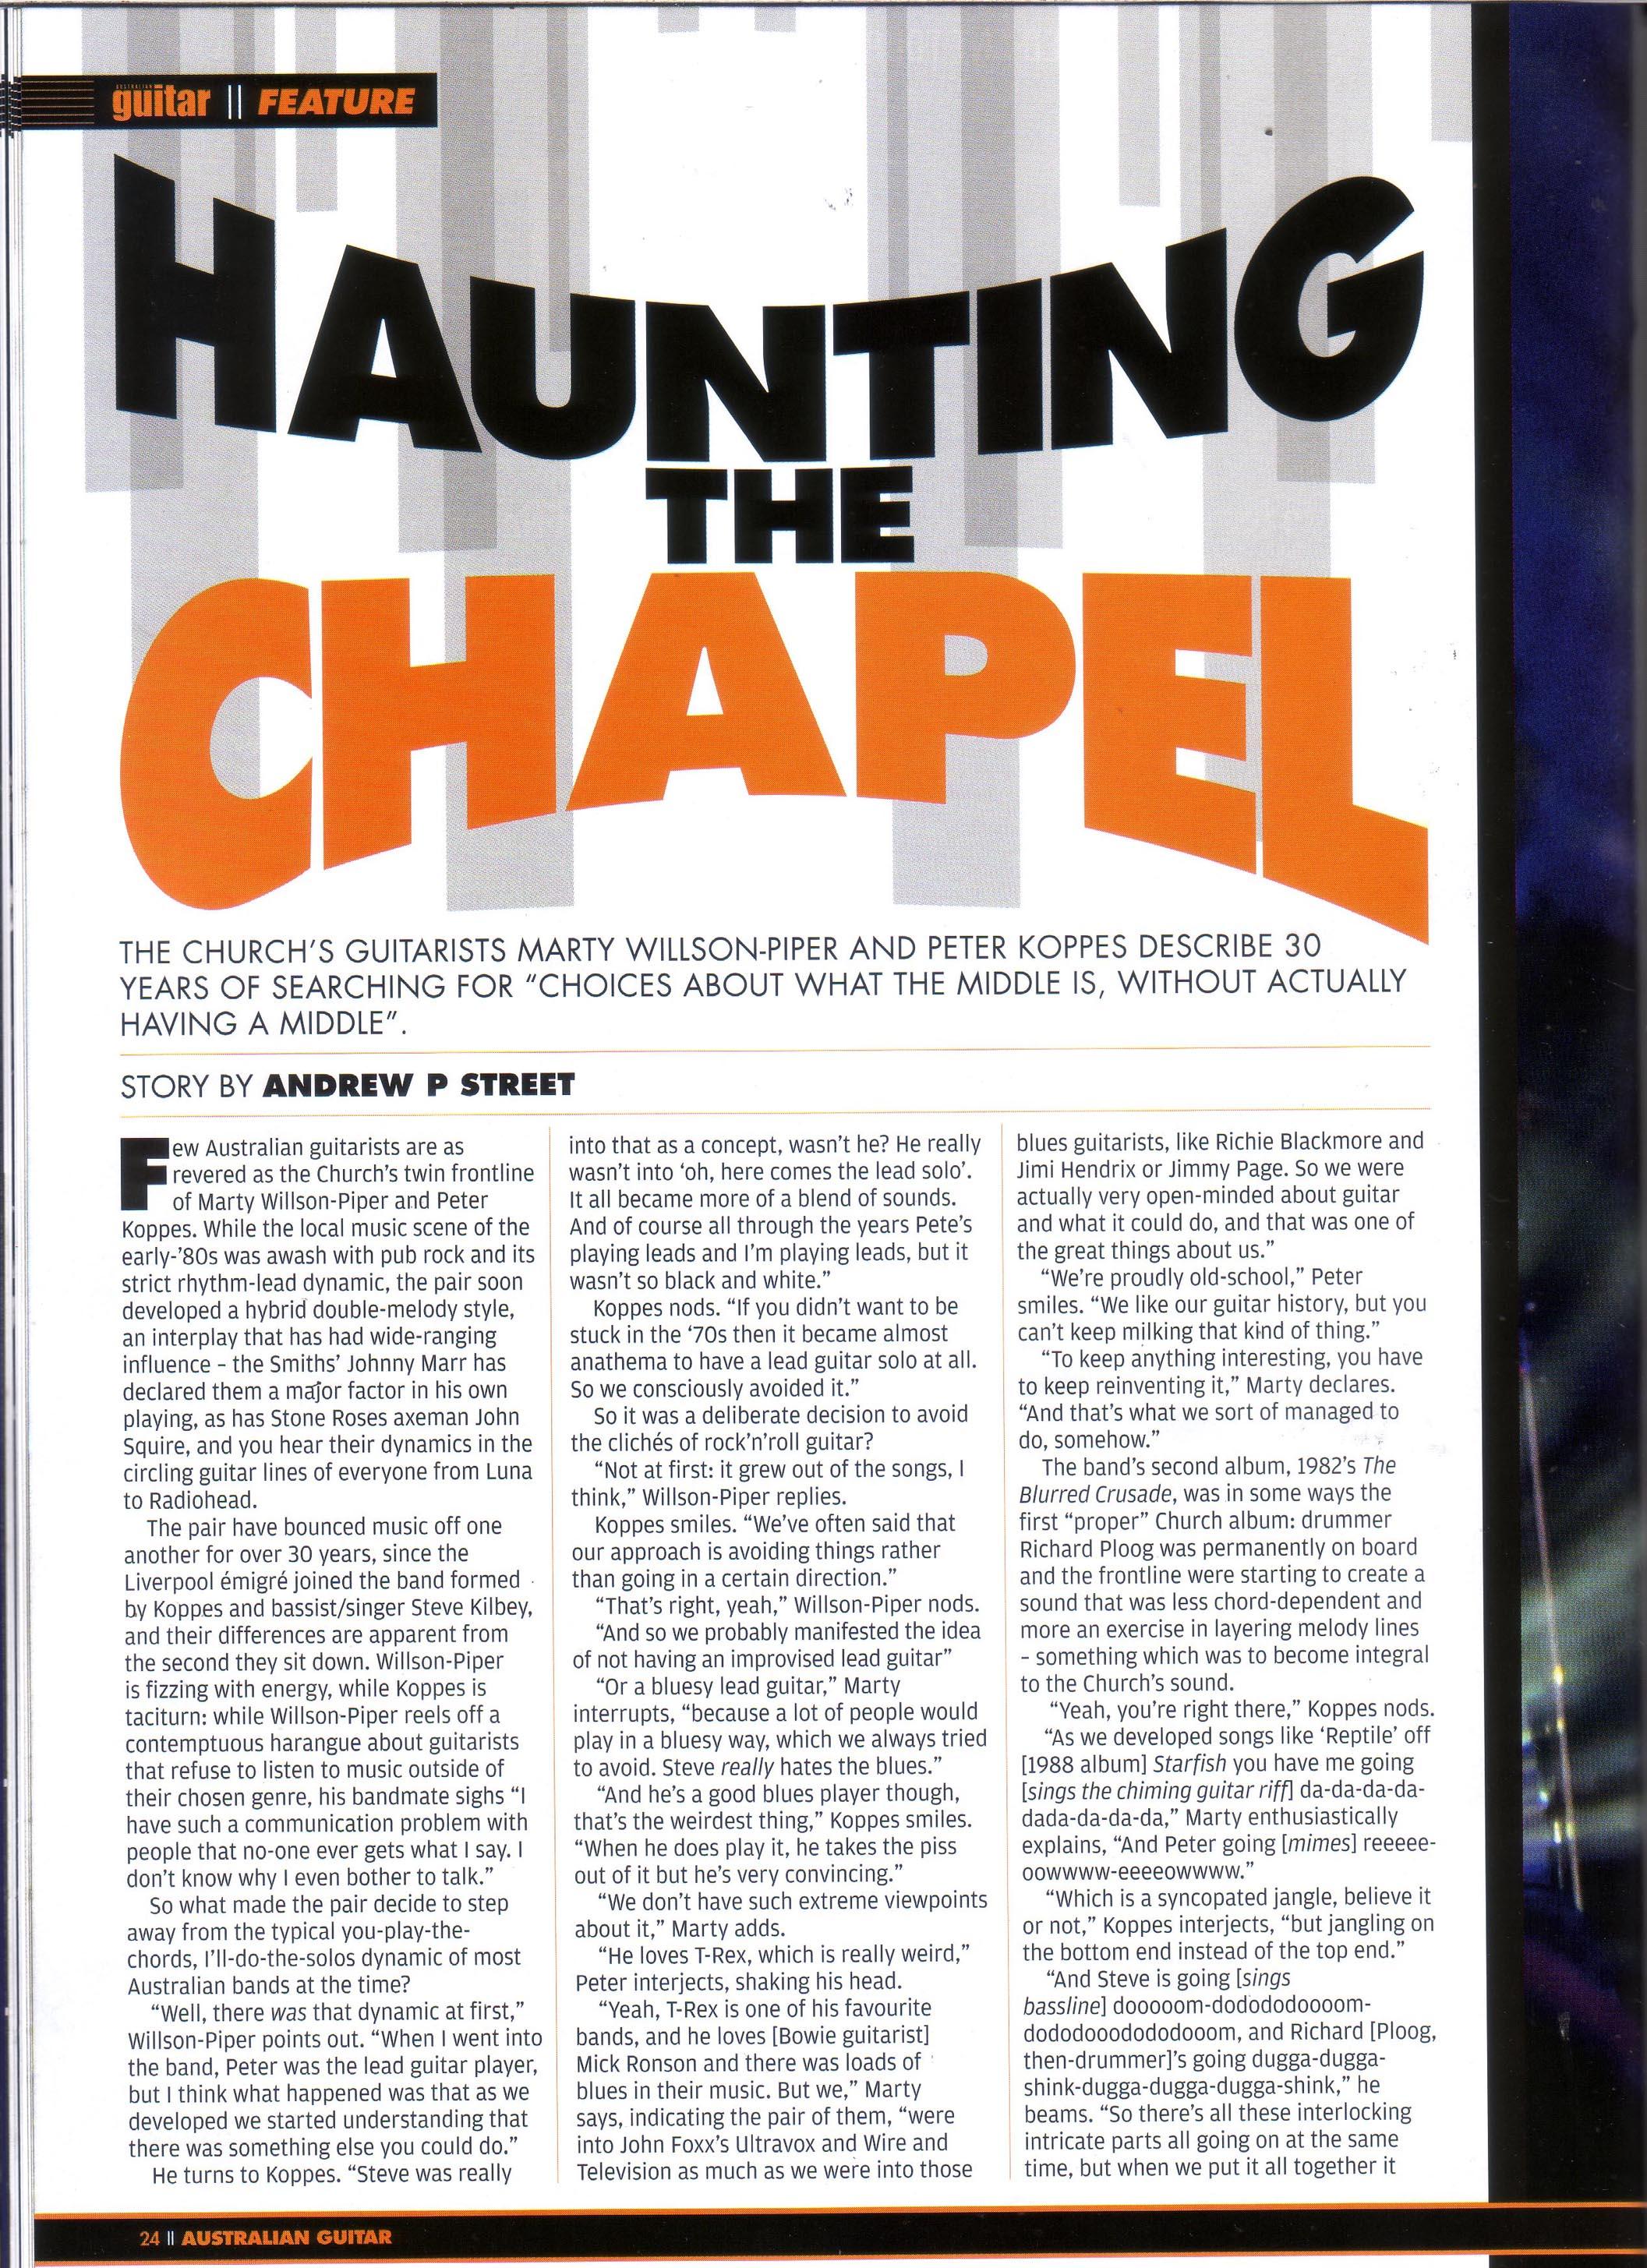 aus guitar march church feature pge 1